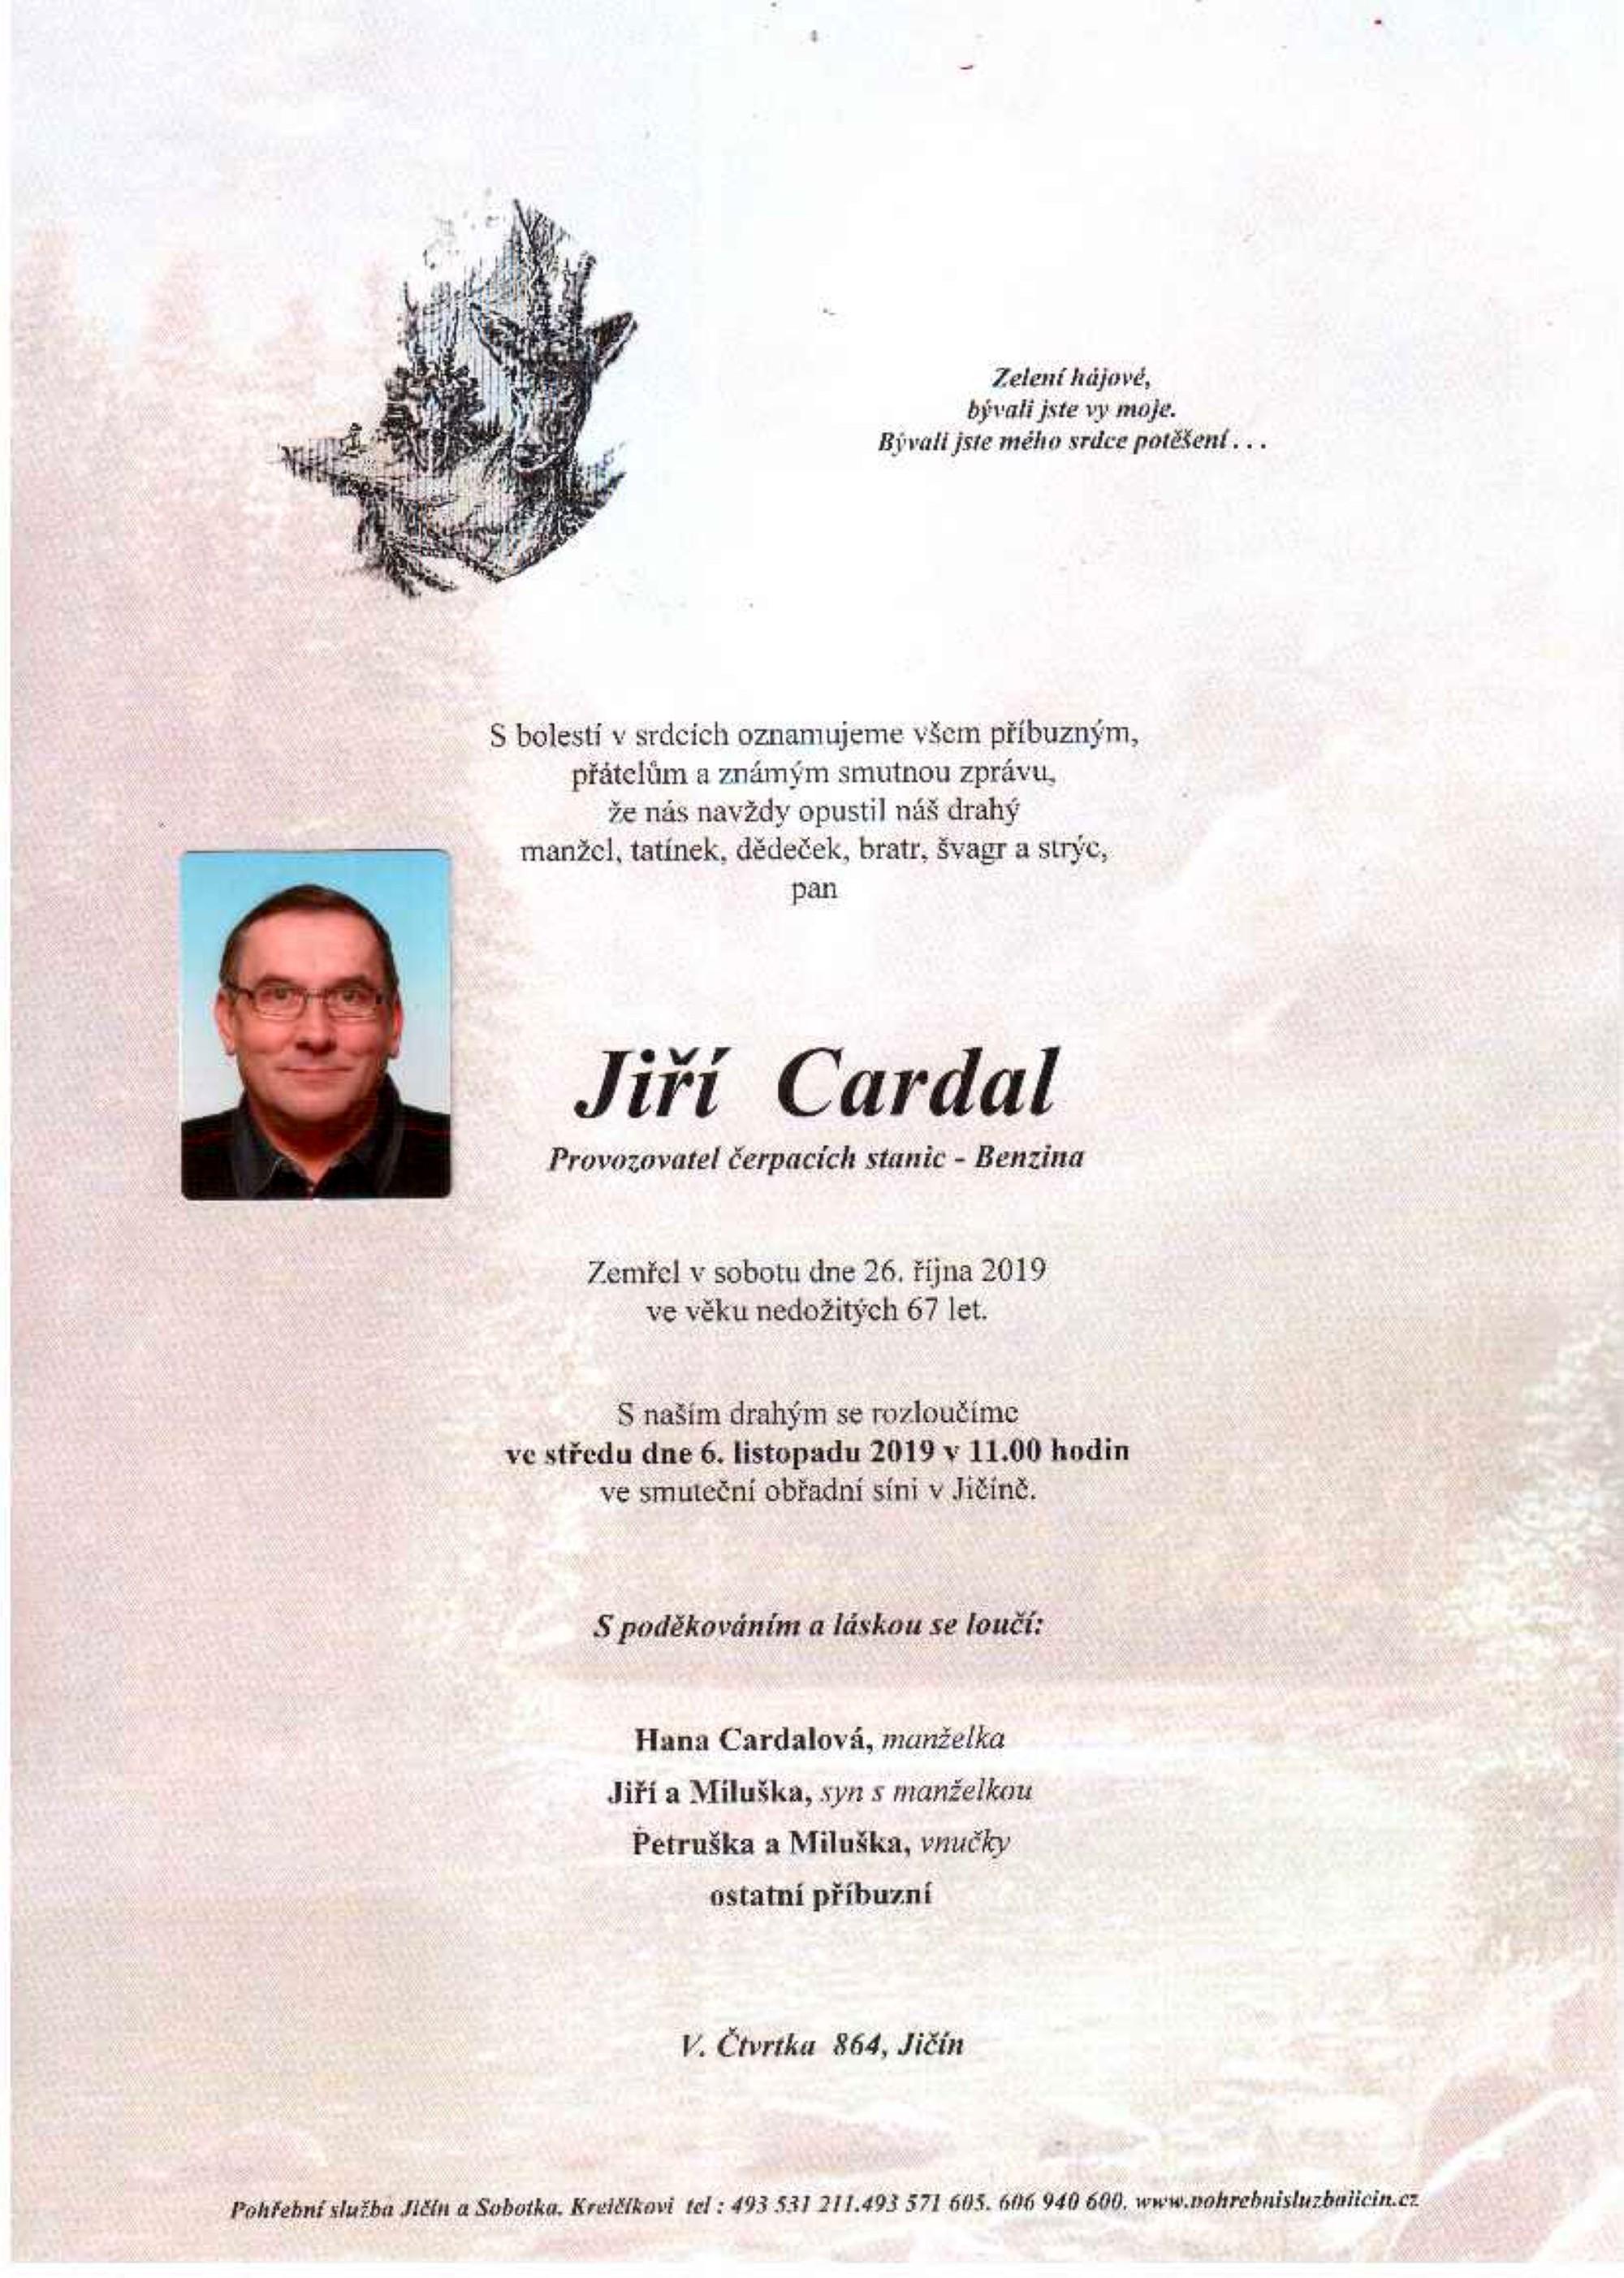 Jiří Cardal